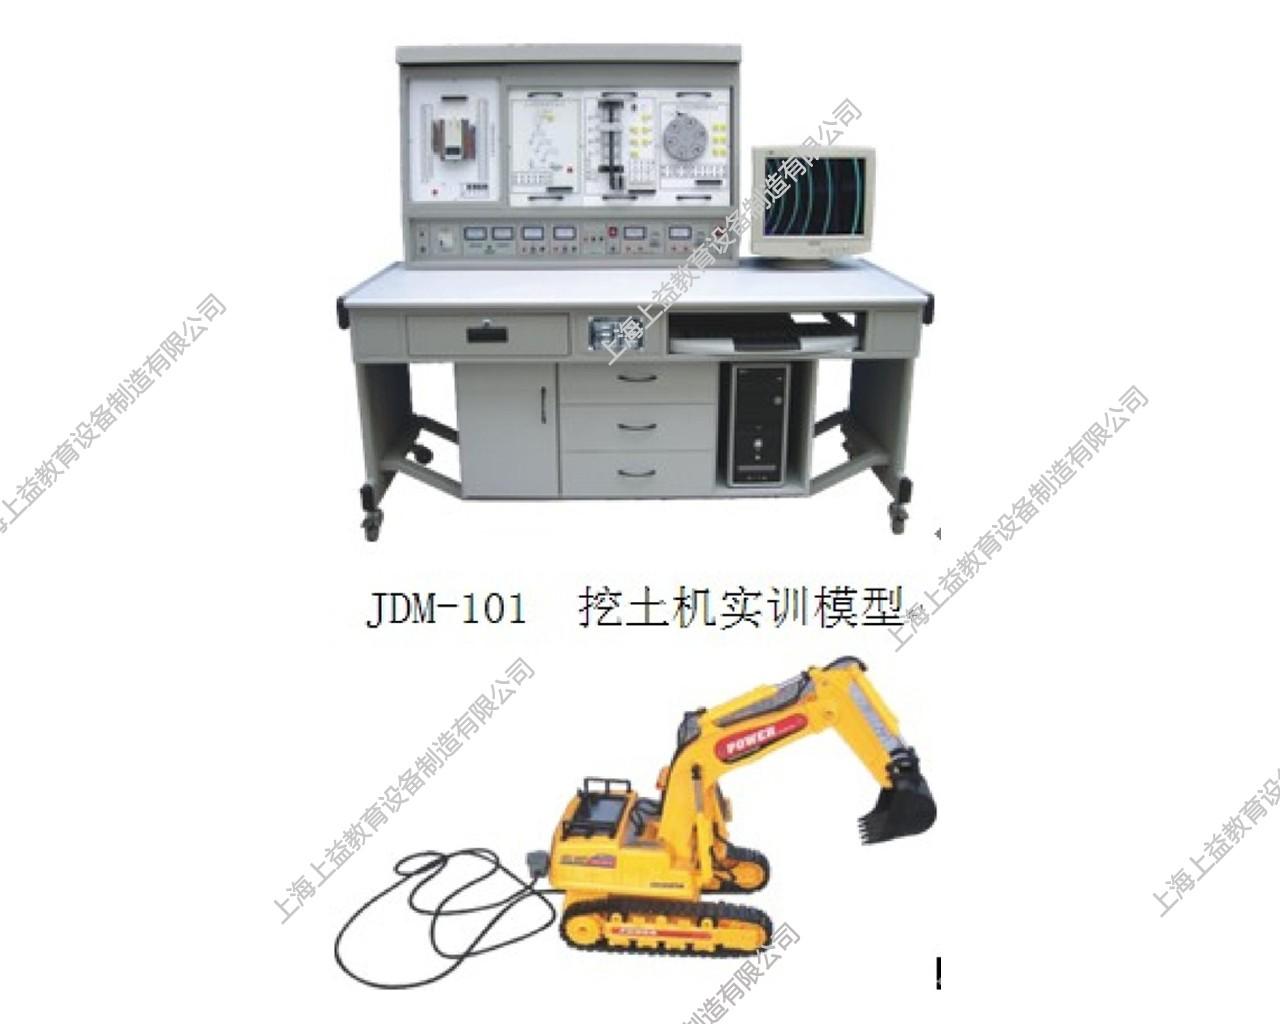 SYPLC-102BPLC可编程控制器/单片机实验开发系统综合装置